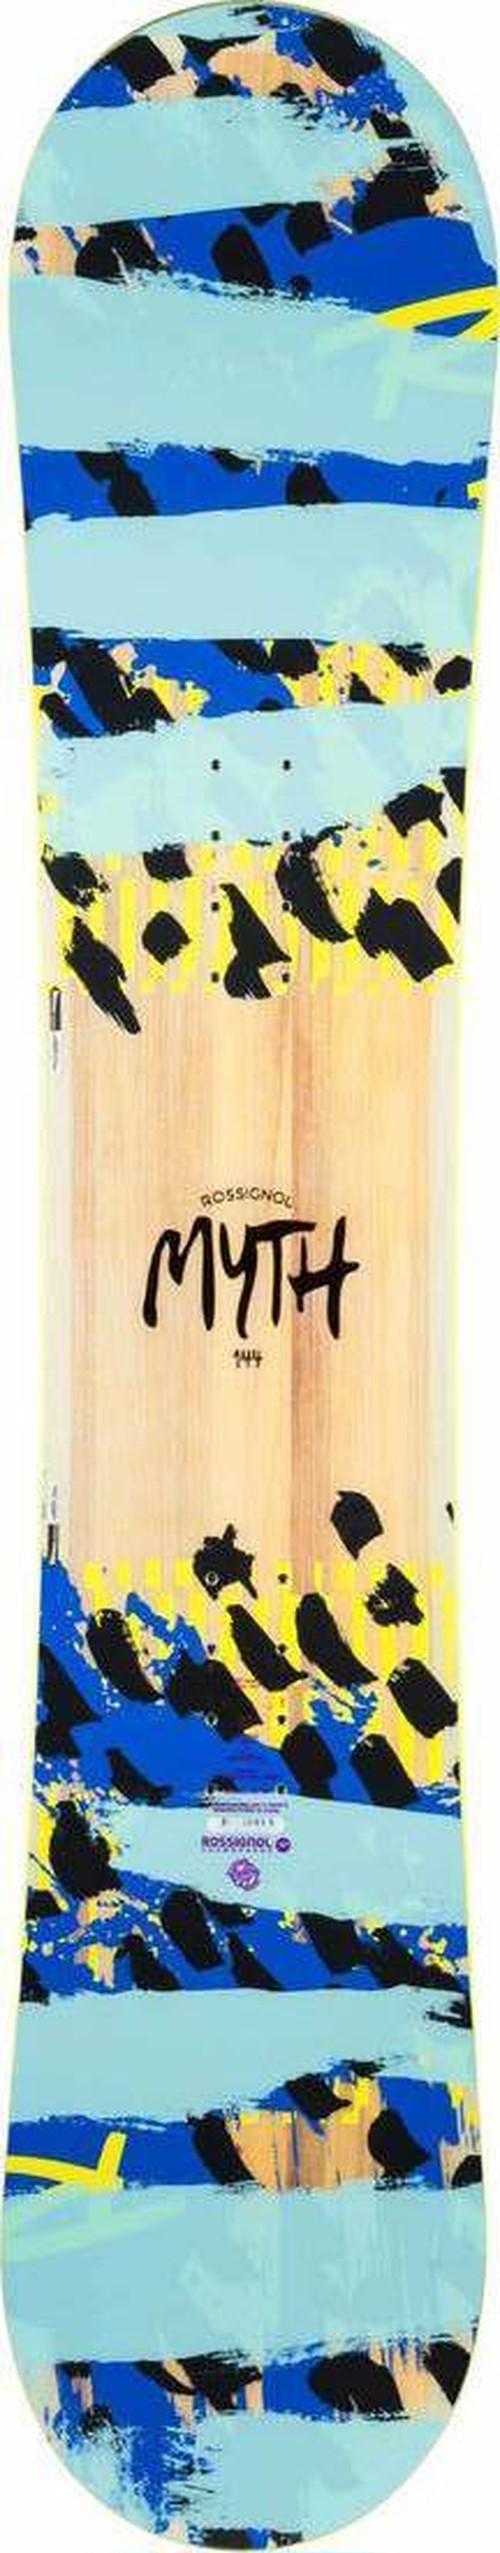 【ROSSIGNOL-MYTH 144】1ヶ月レンタルプラン